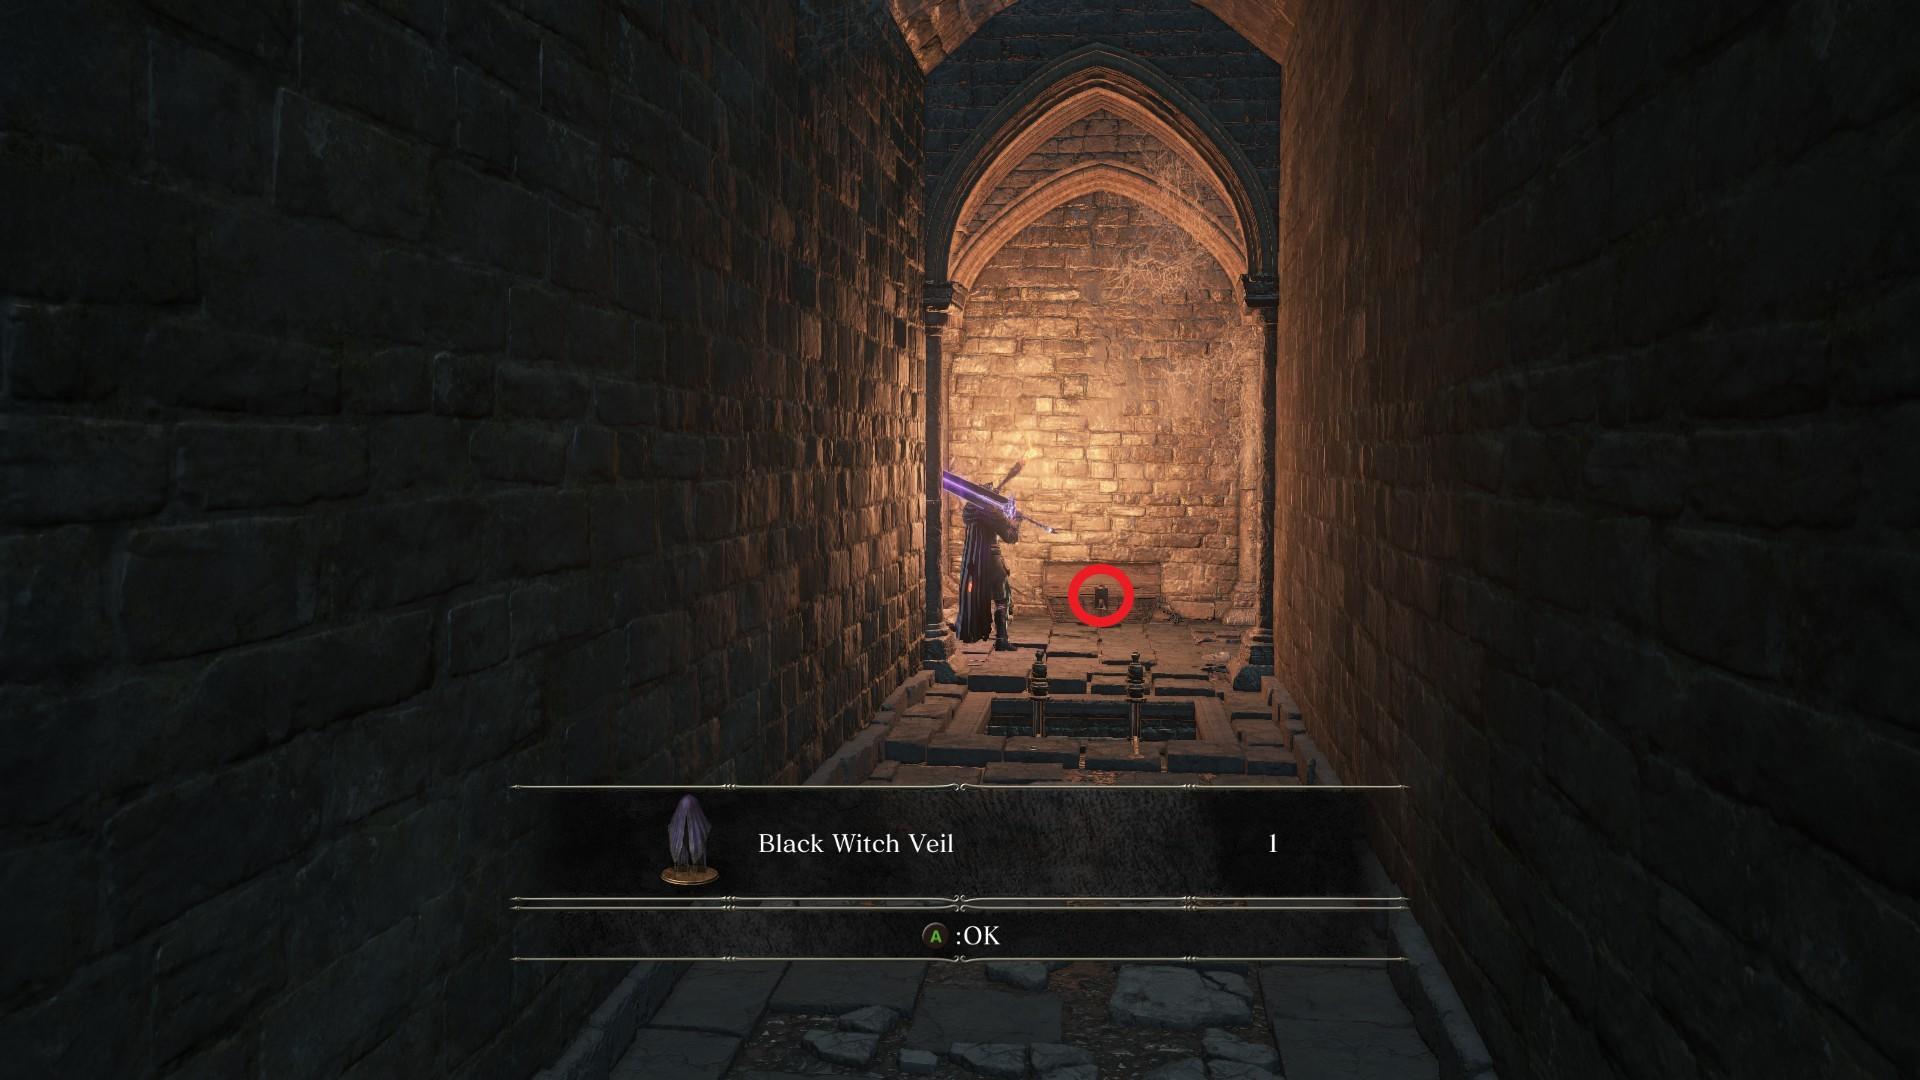 Black_Witch_Veil.jpg